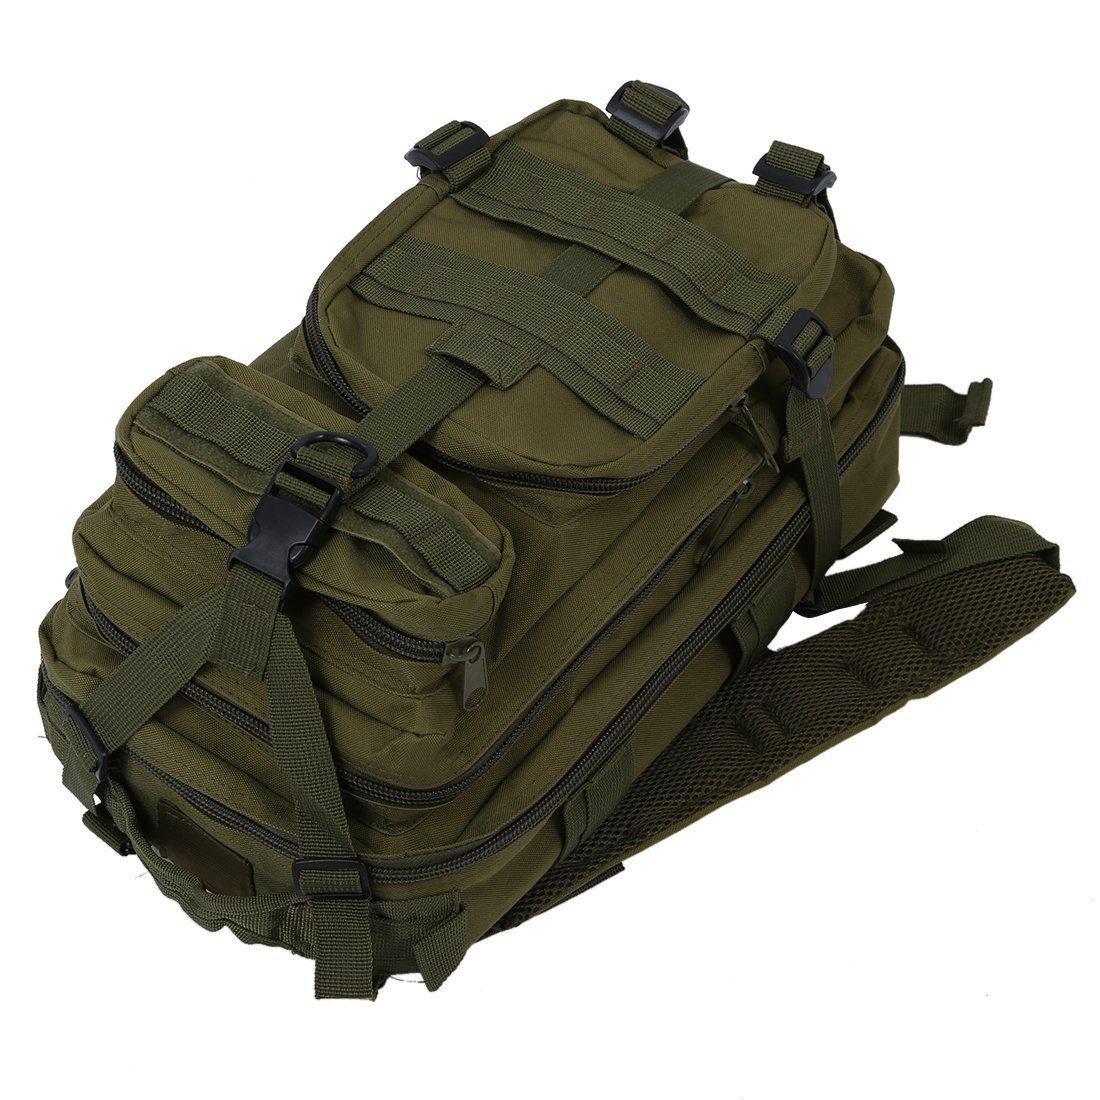 TOOGOO 30L Tactique Exterieure Militaire Sac a dos Camping Sac a dos Randonnee Trekking Sac R Vert